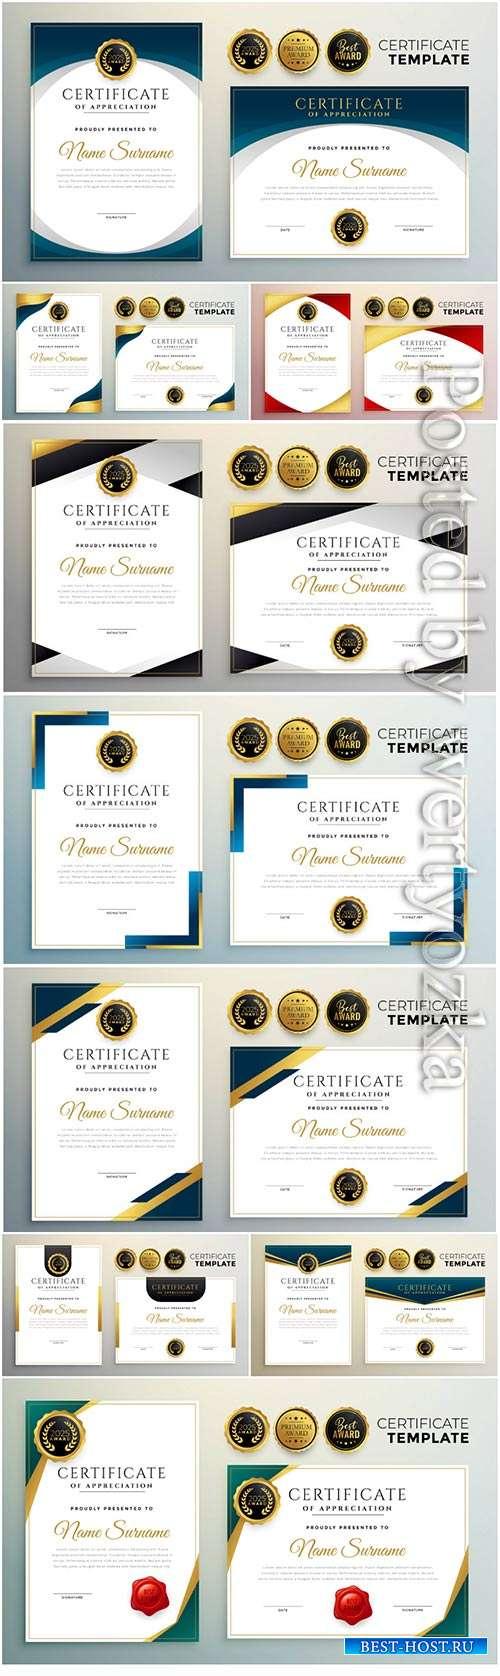 Creative certificate of appreciation template modern design